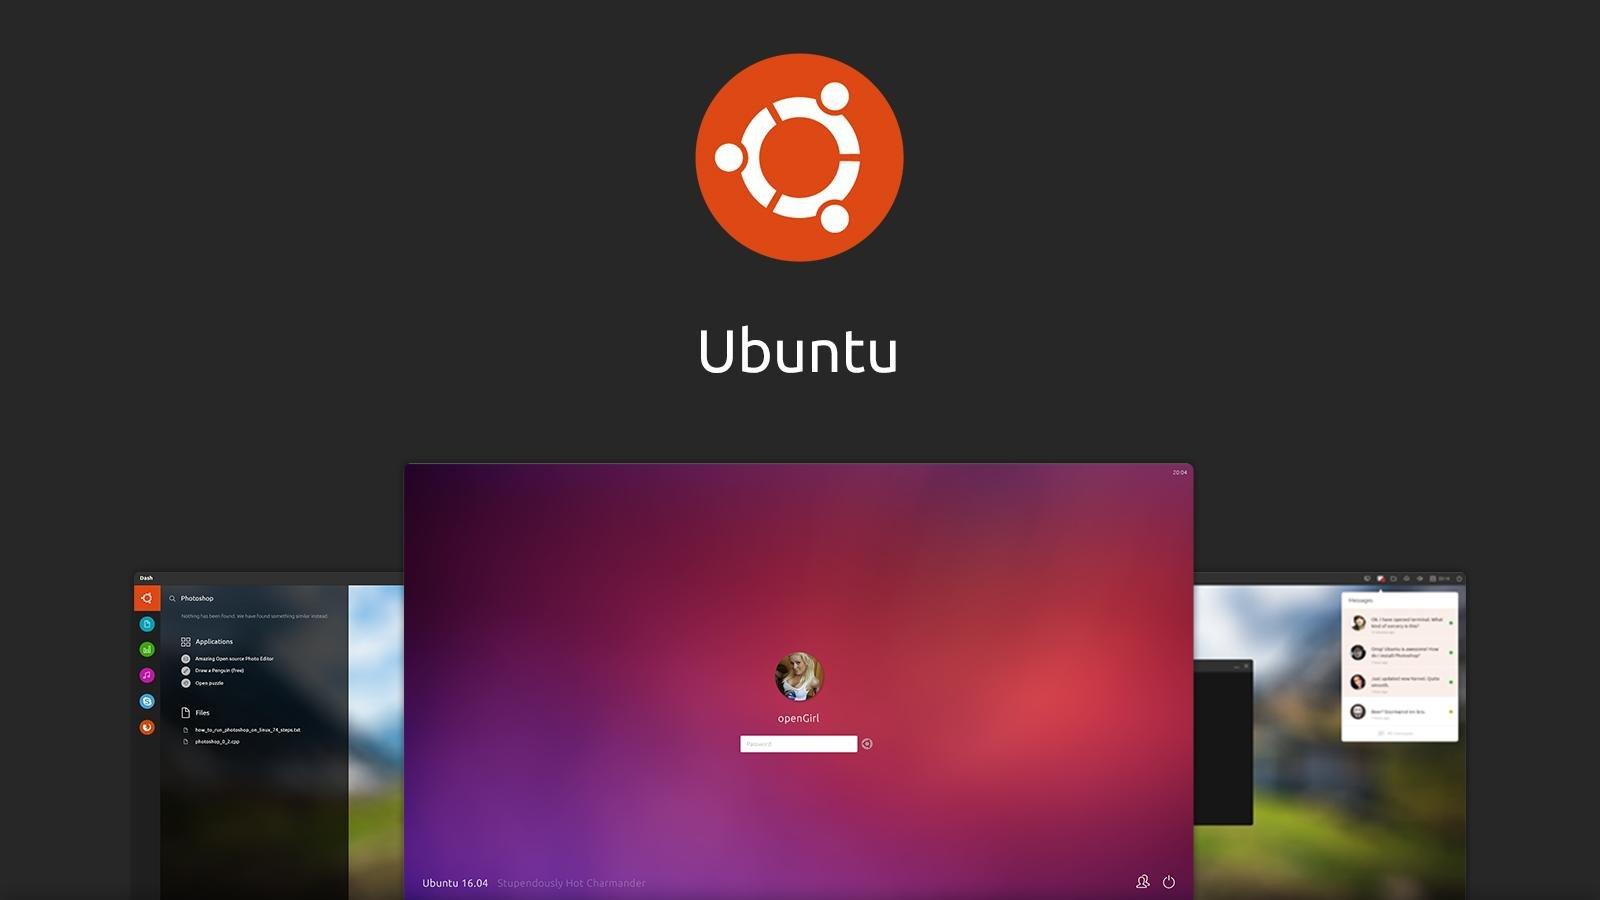 В чем разница между Ubuntu и дистрибутивами на основе Ubuntu?